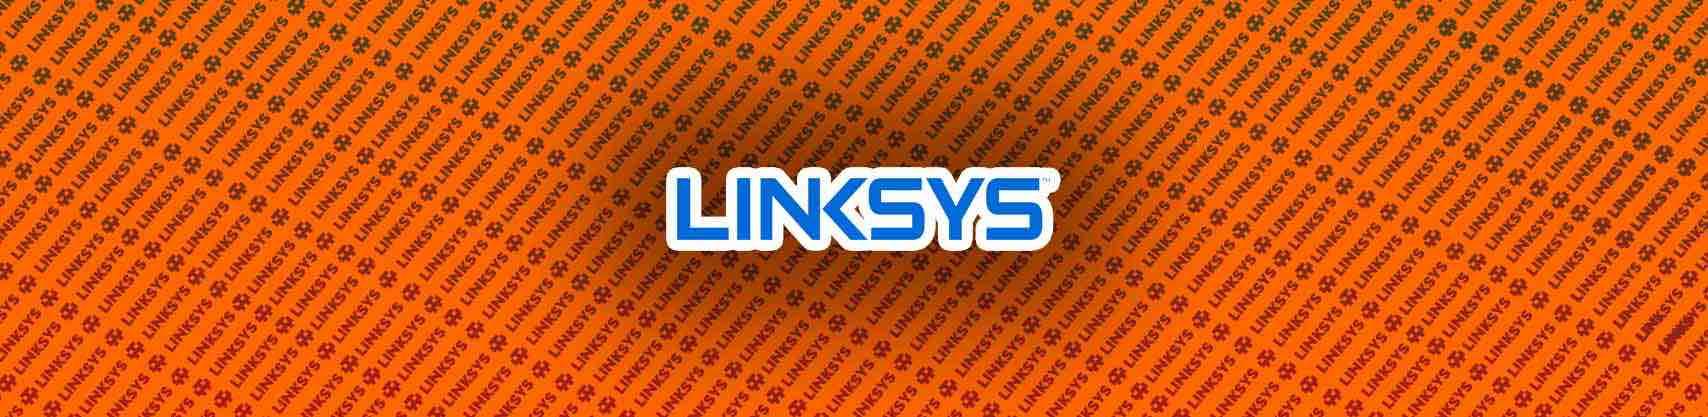 Linksys RE6700 Manual